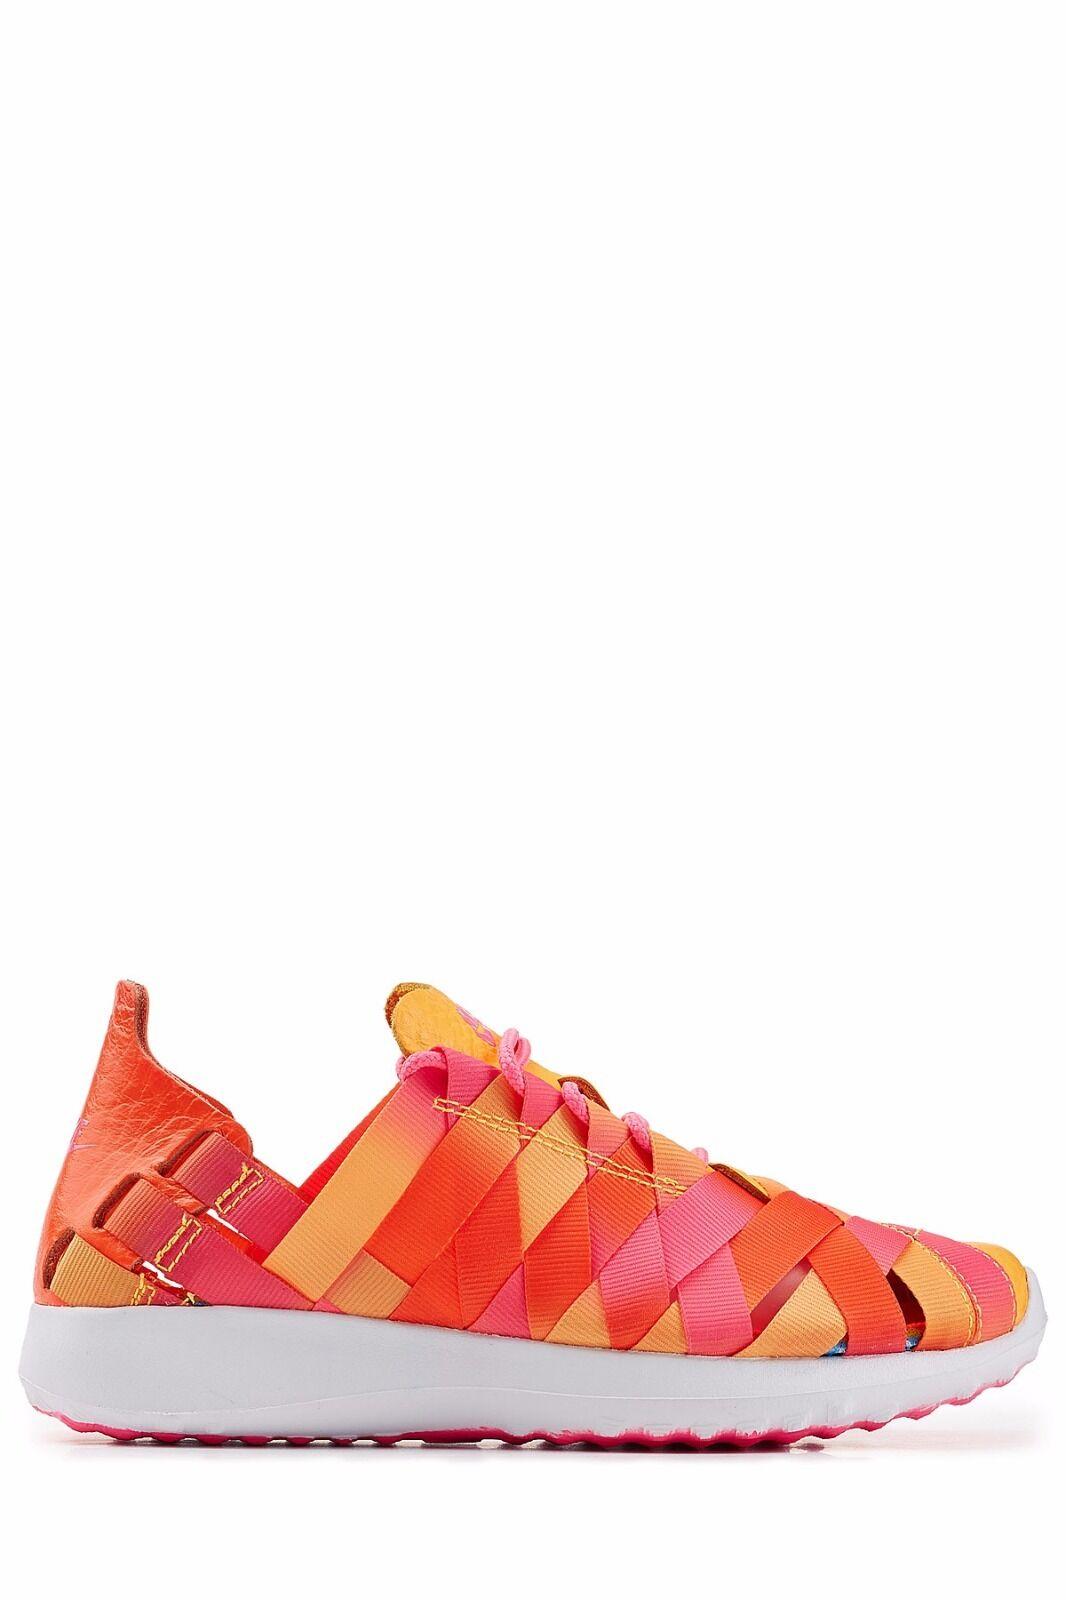 WMNS Nike Juvenate Woven PRM Casual Blast/Orange-Red rose Blast/Orange-Red Casual fdeea6